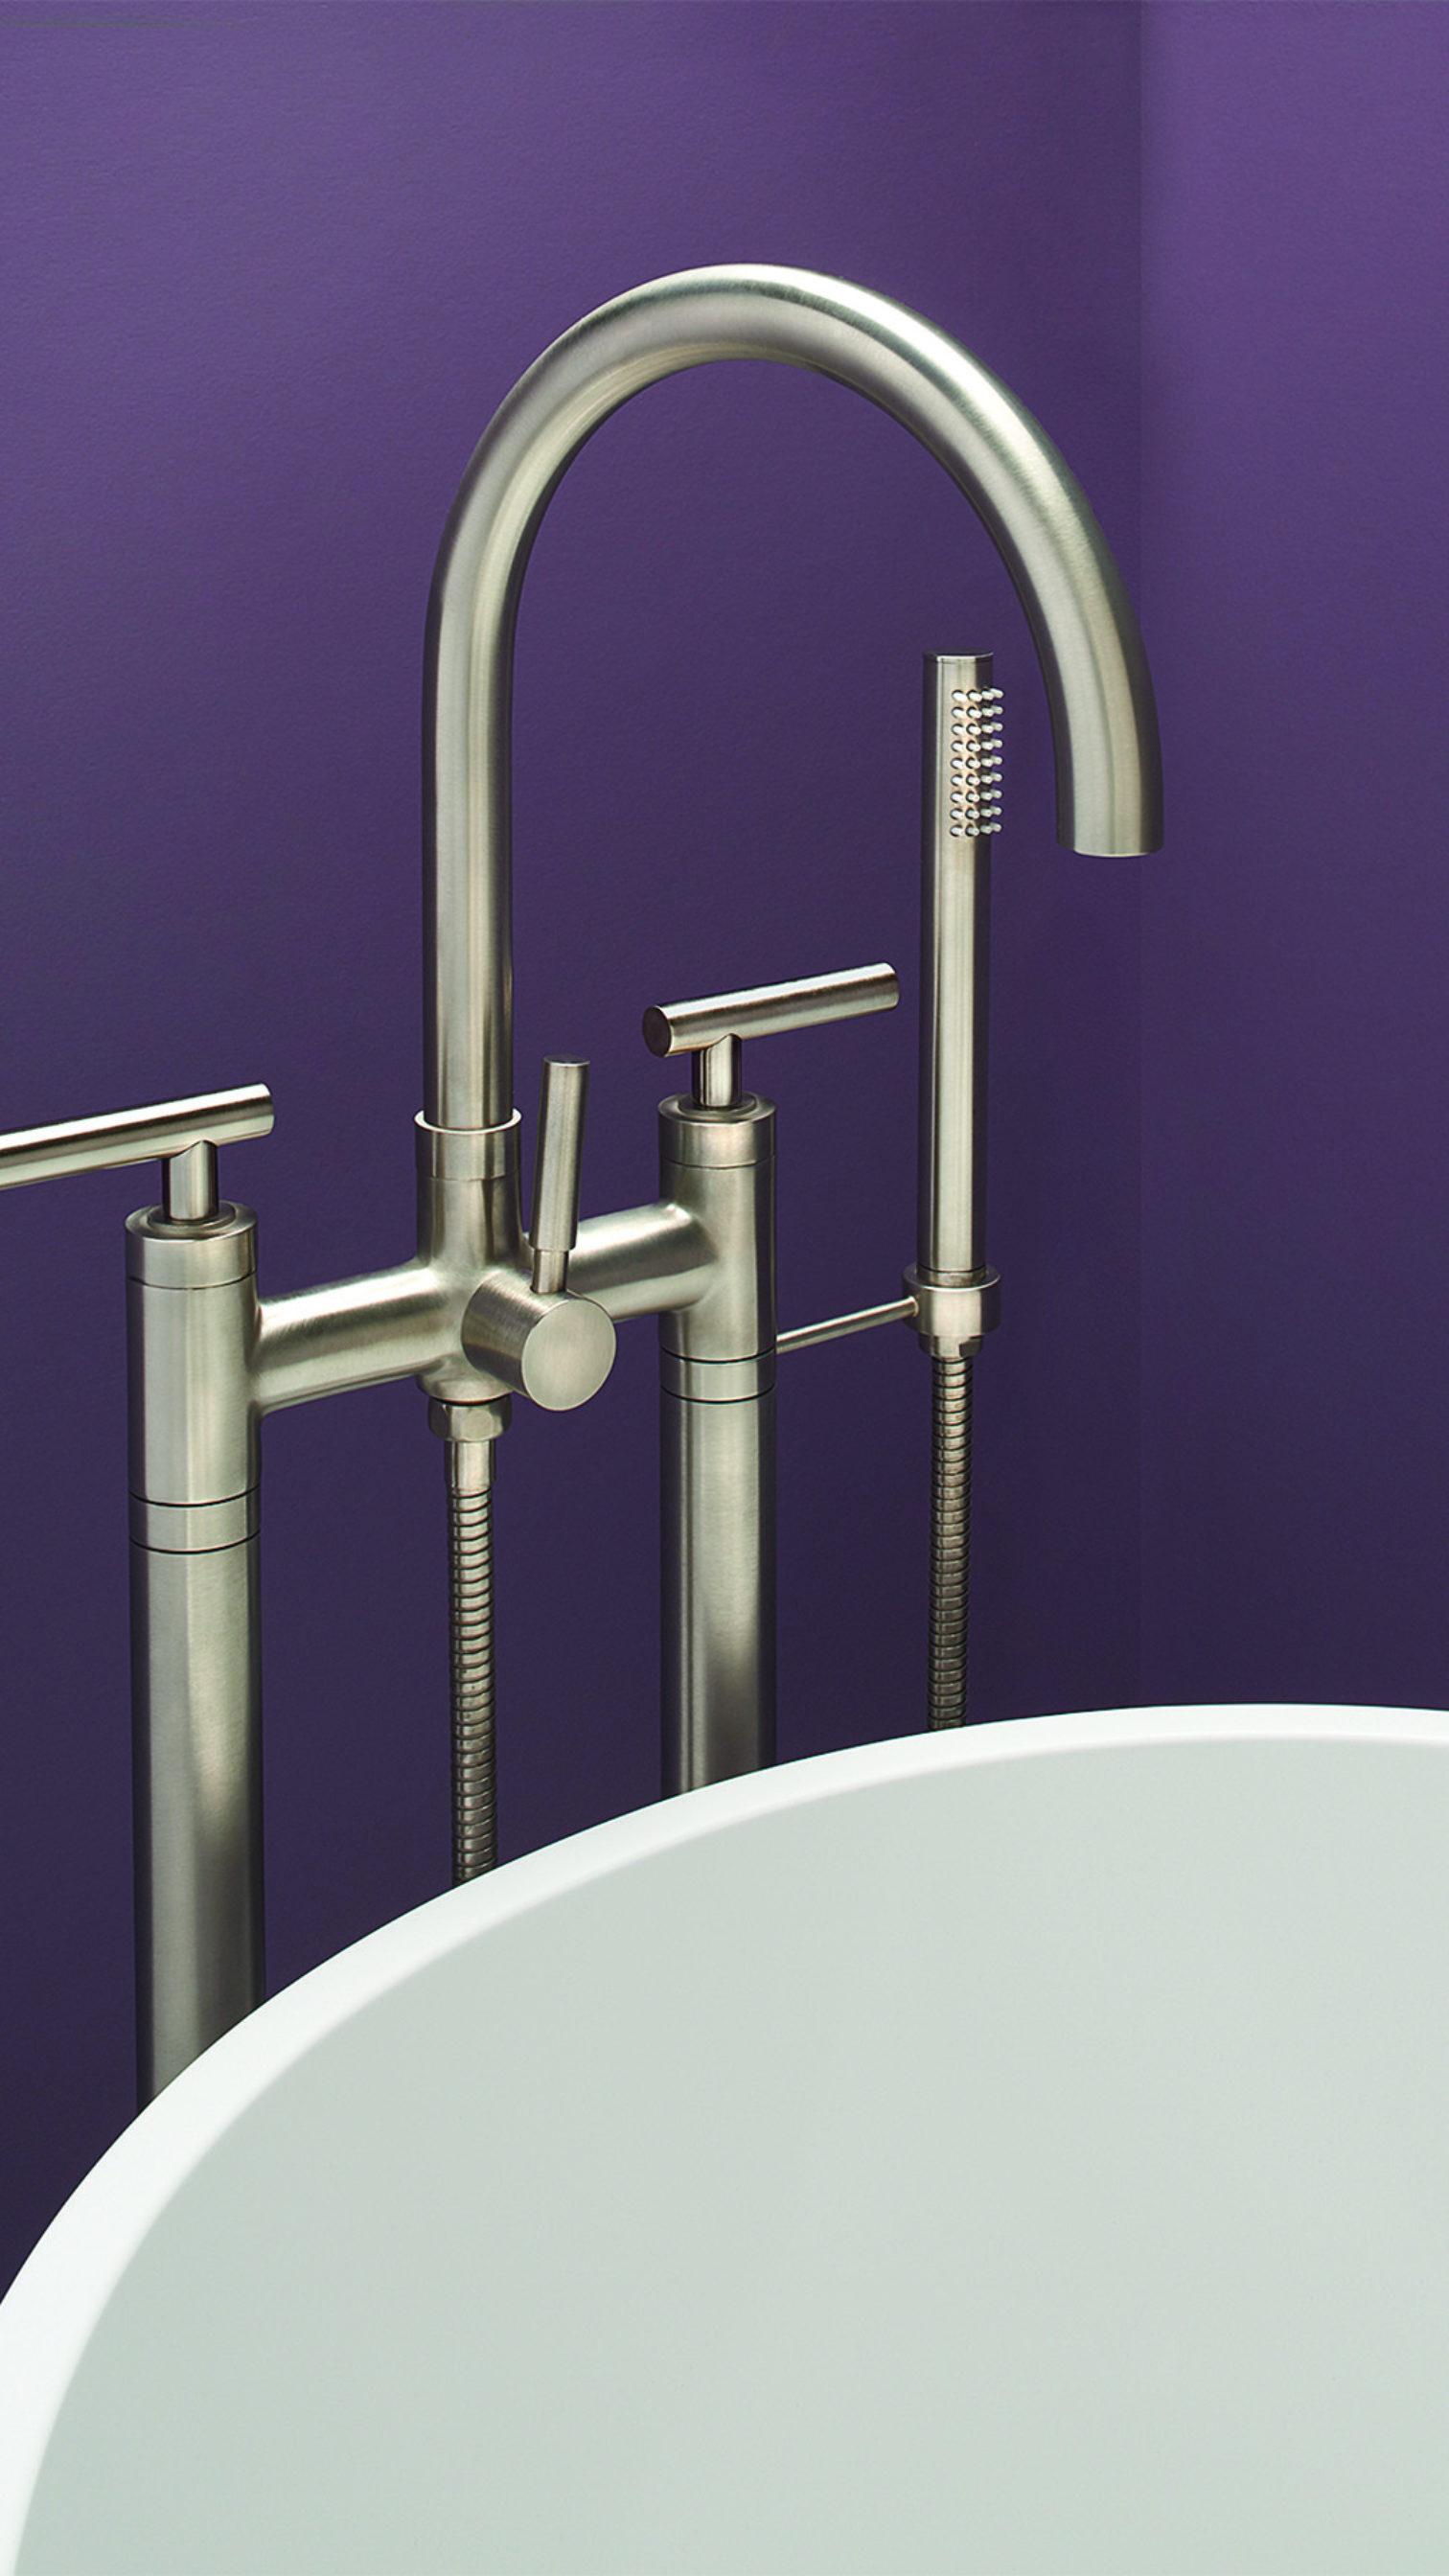 Bathroom Series Asilomar tub filler with purple background